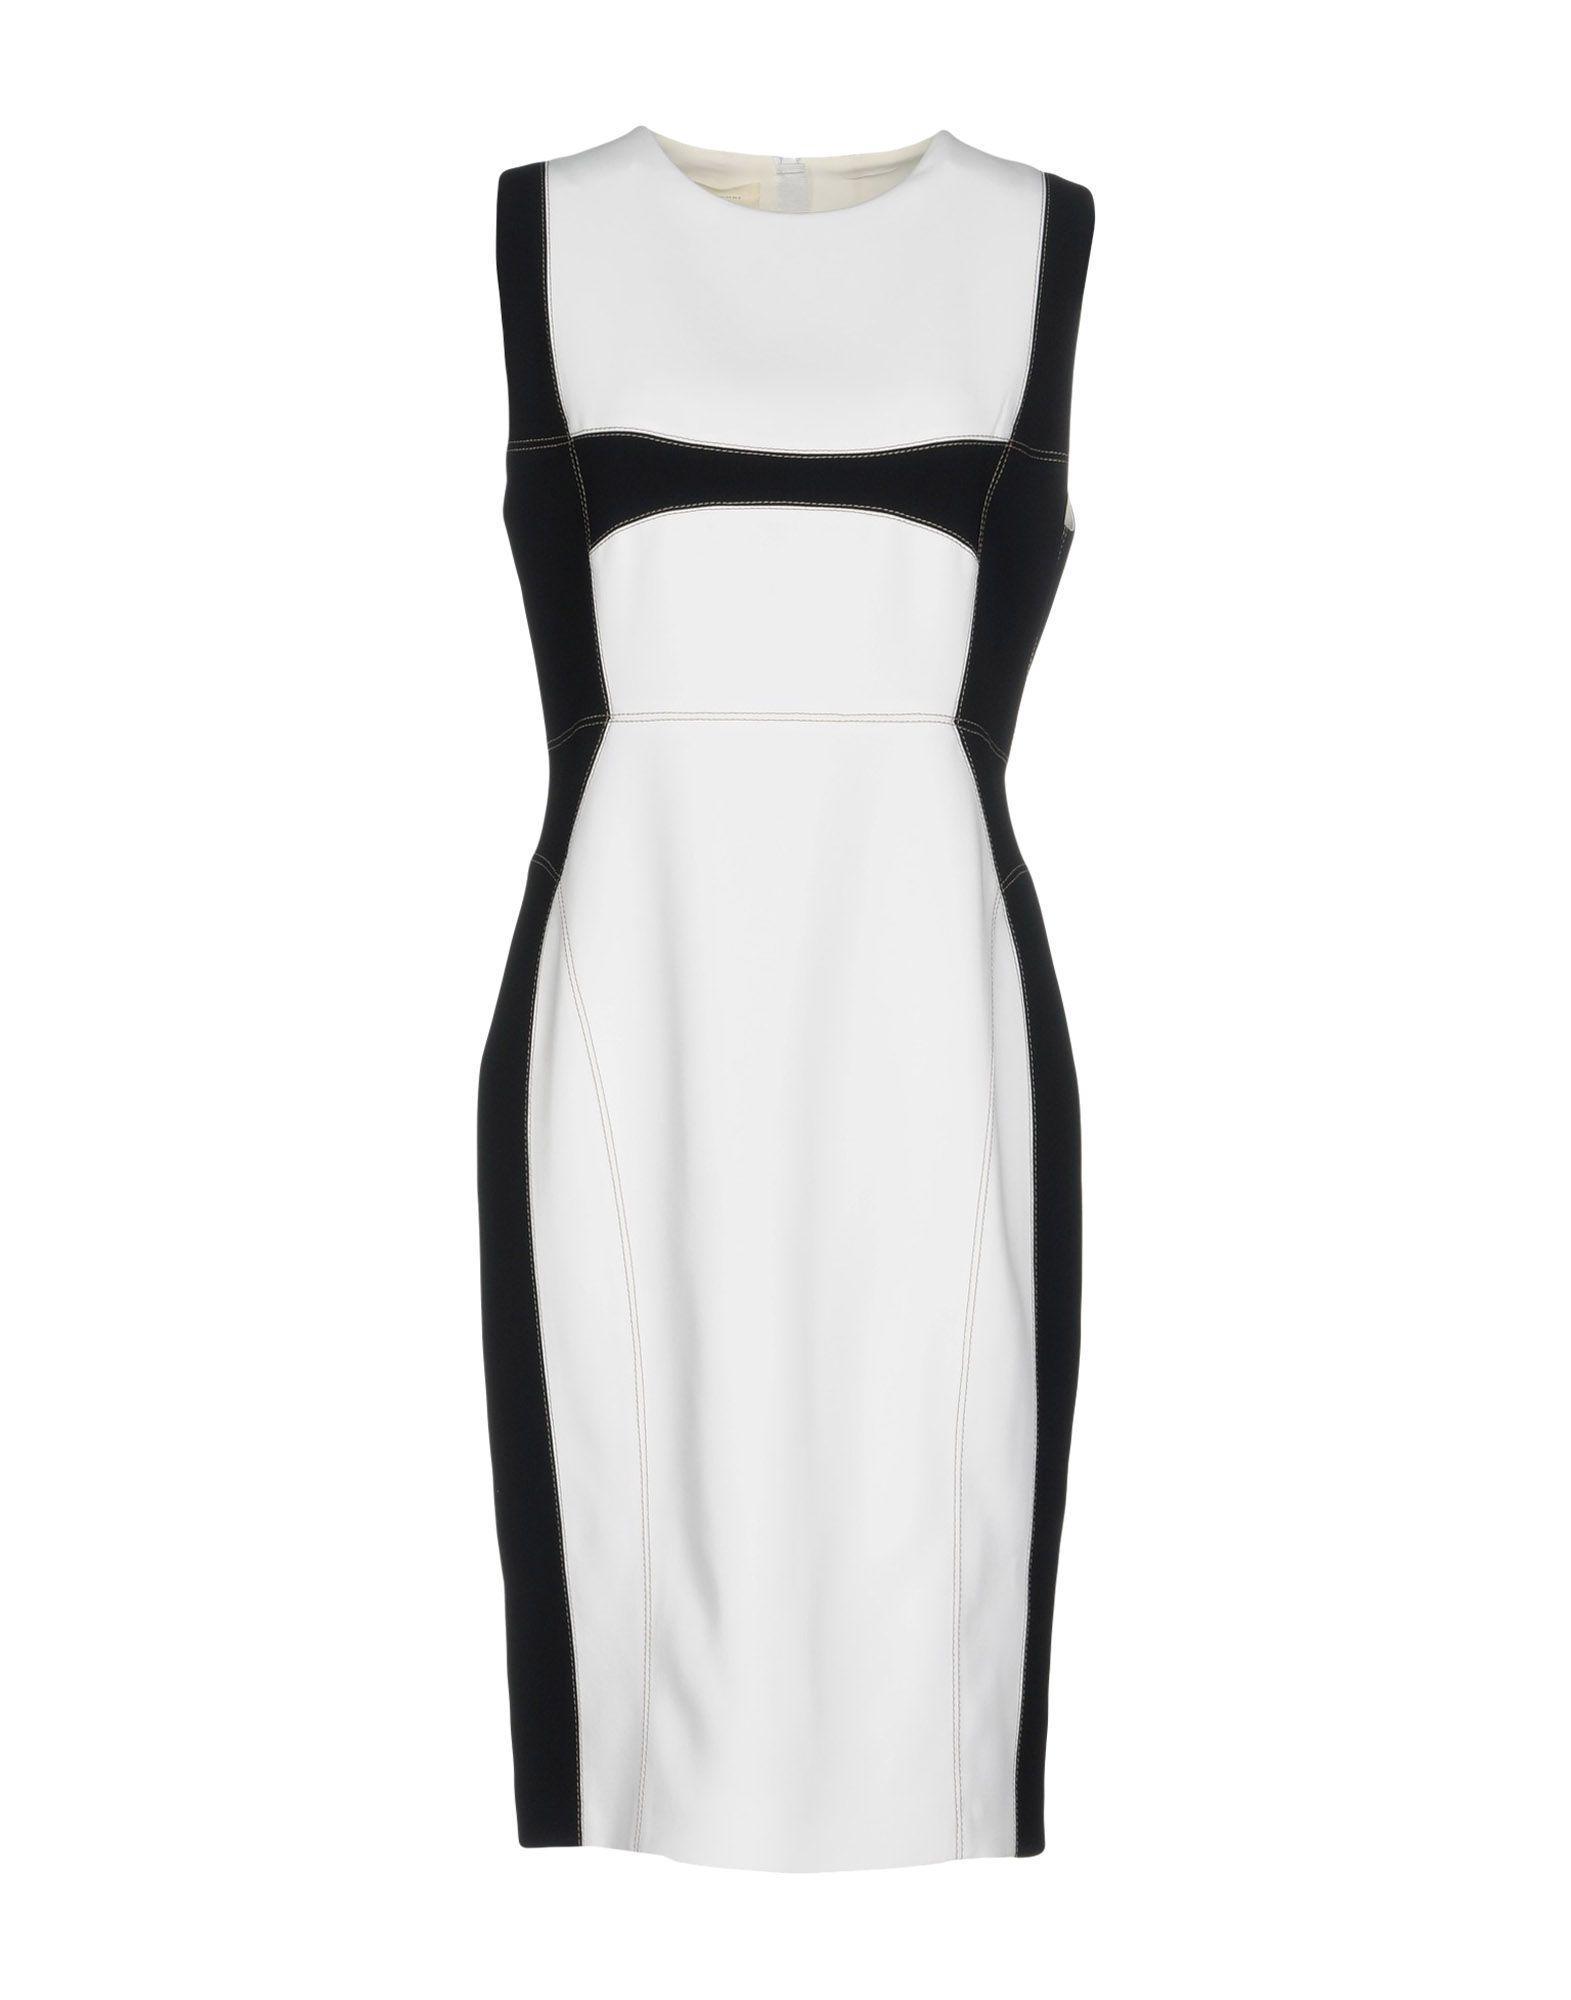 DRESSES - Knee-length dresses Aquilano Rimondi Footaction Cheap Price Excellent For Sale Cheap Sale Best Sale Geniue Stockist Cheap Price Affordable Cheap Online fESgWJU